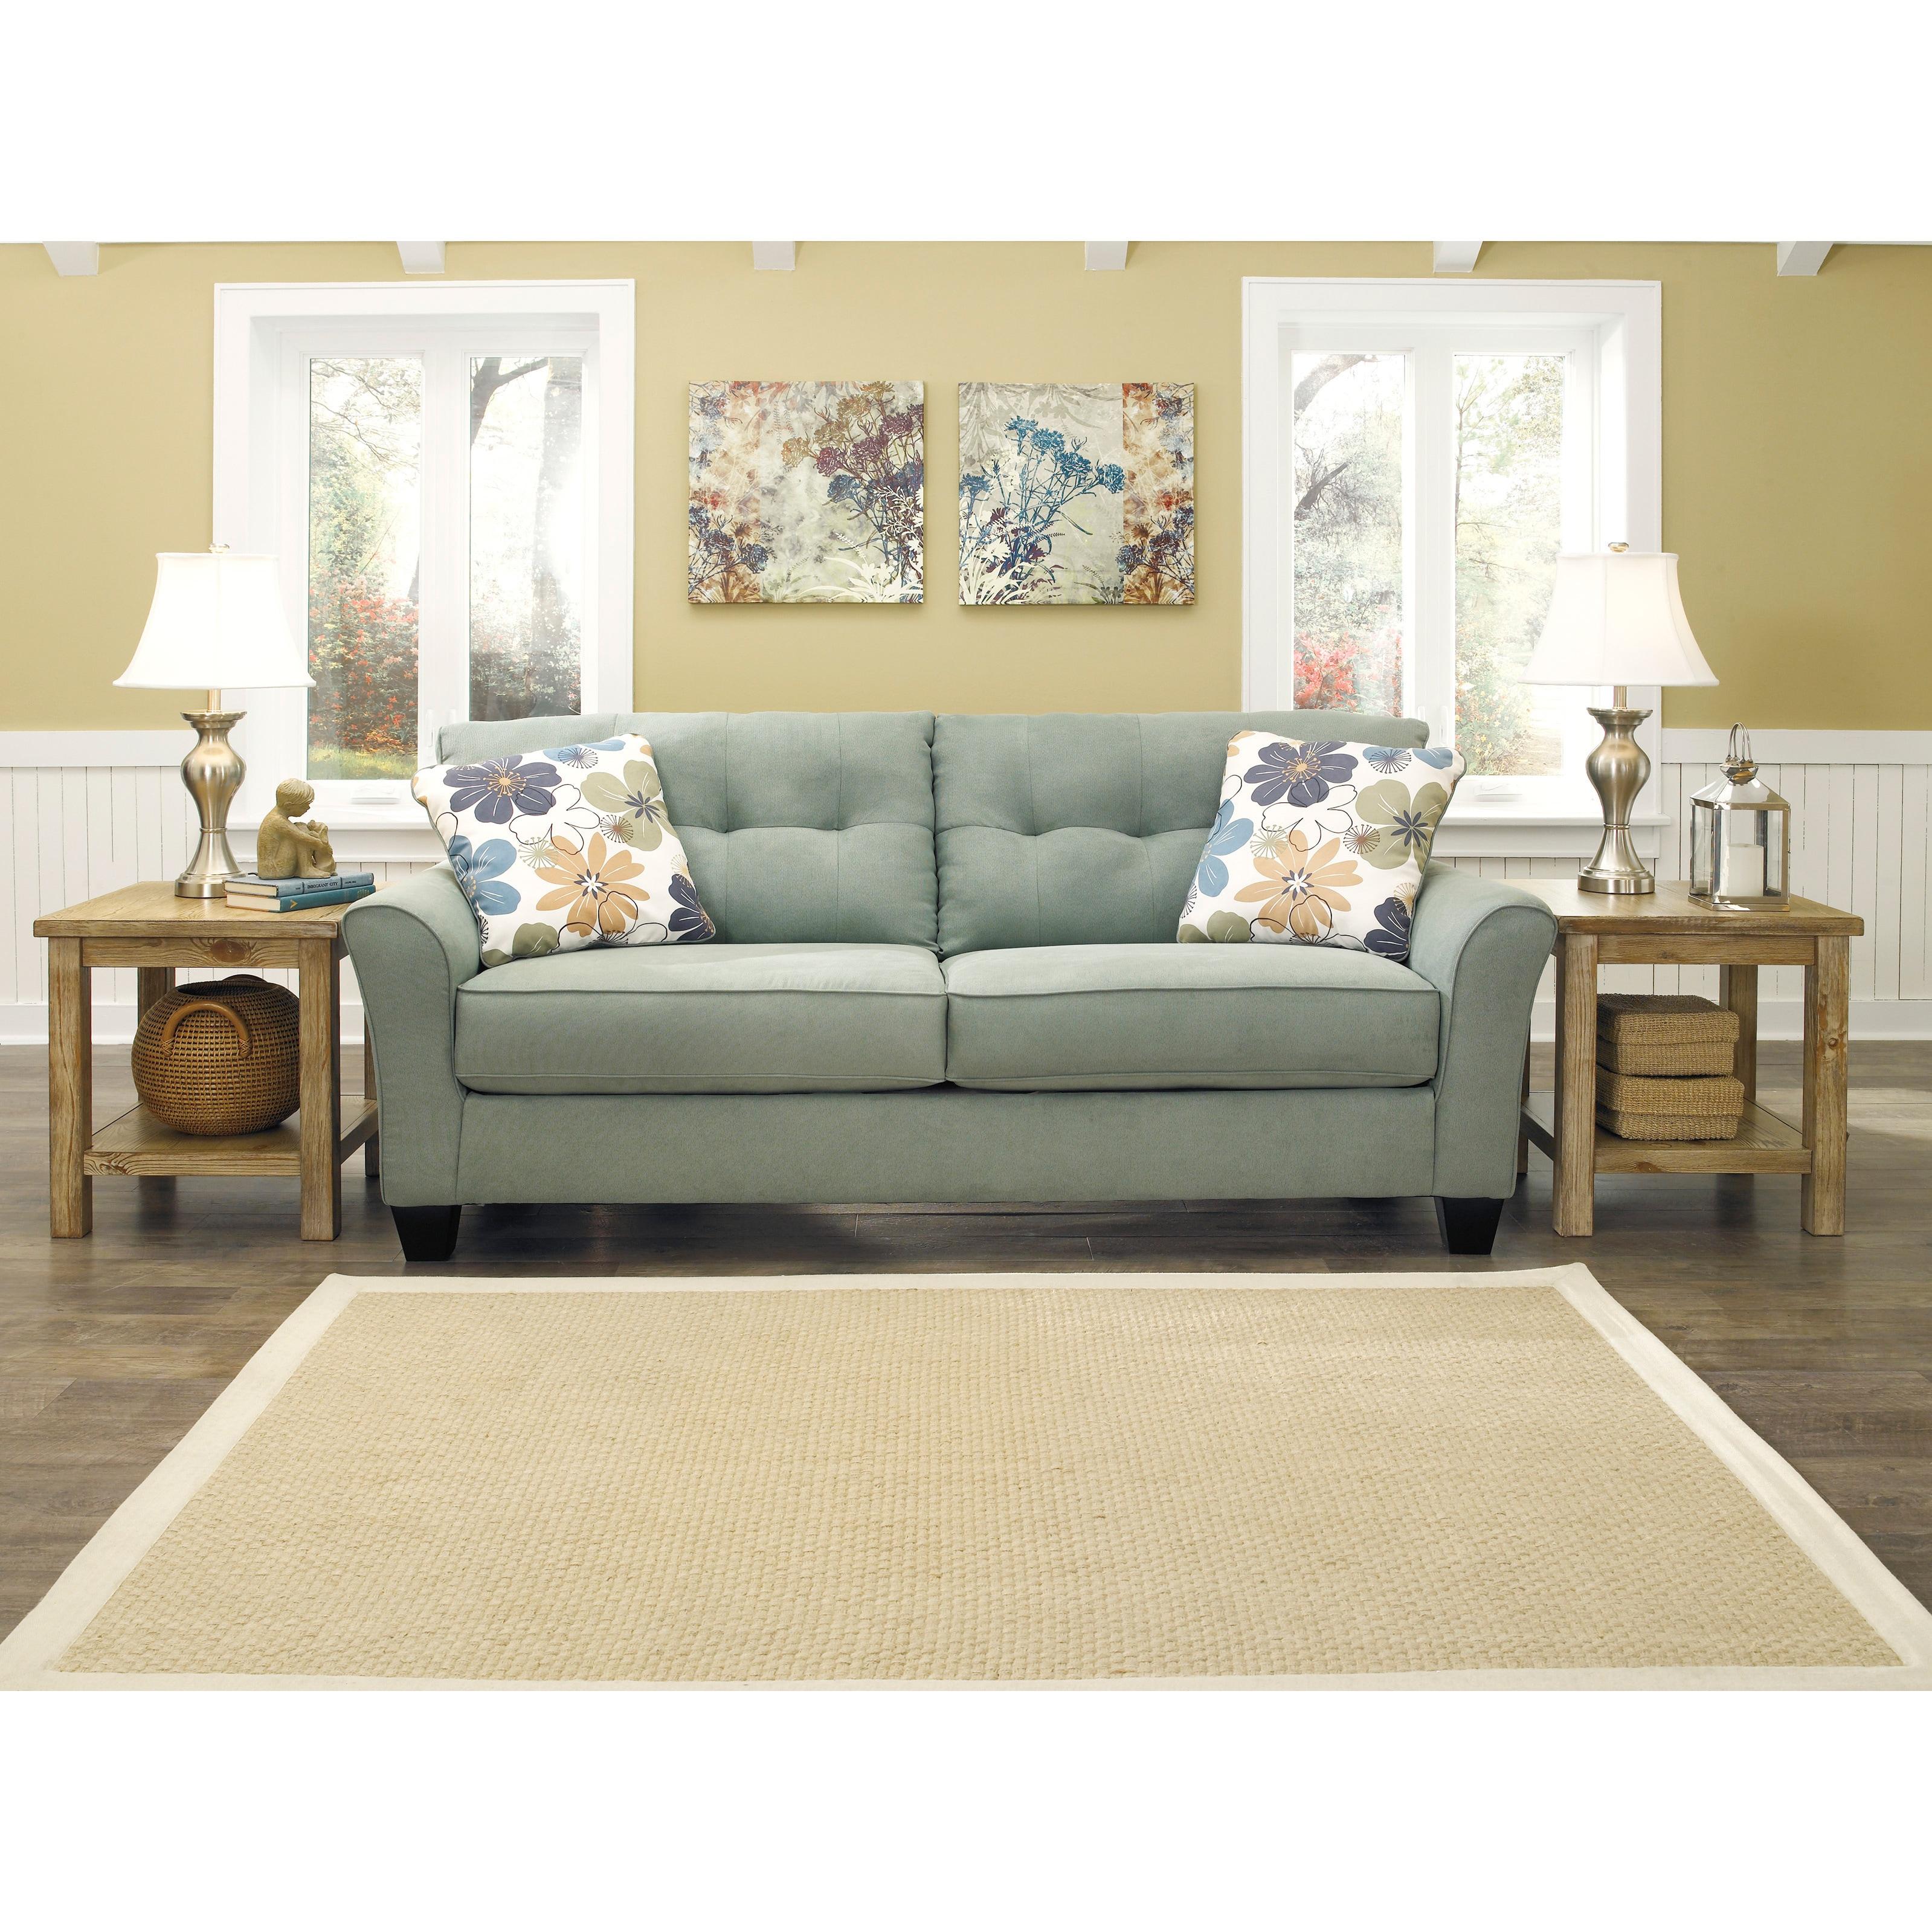 Signature Design by Ashley Kylee Lagoon Contemporary Sofa